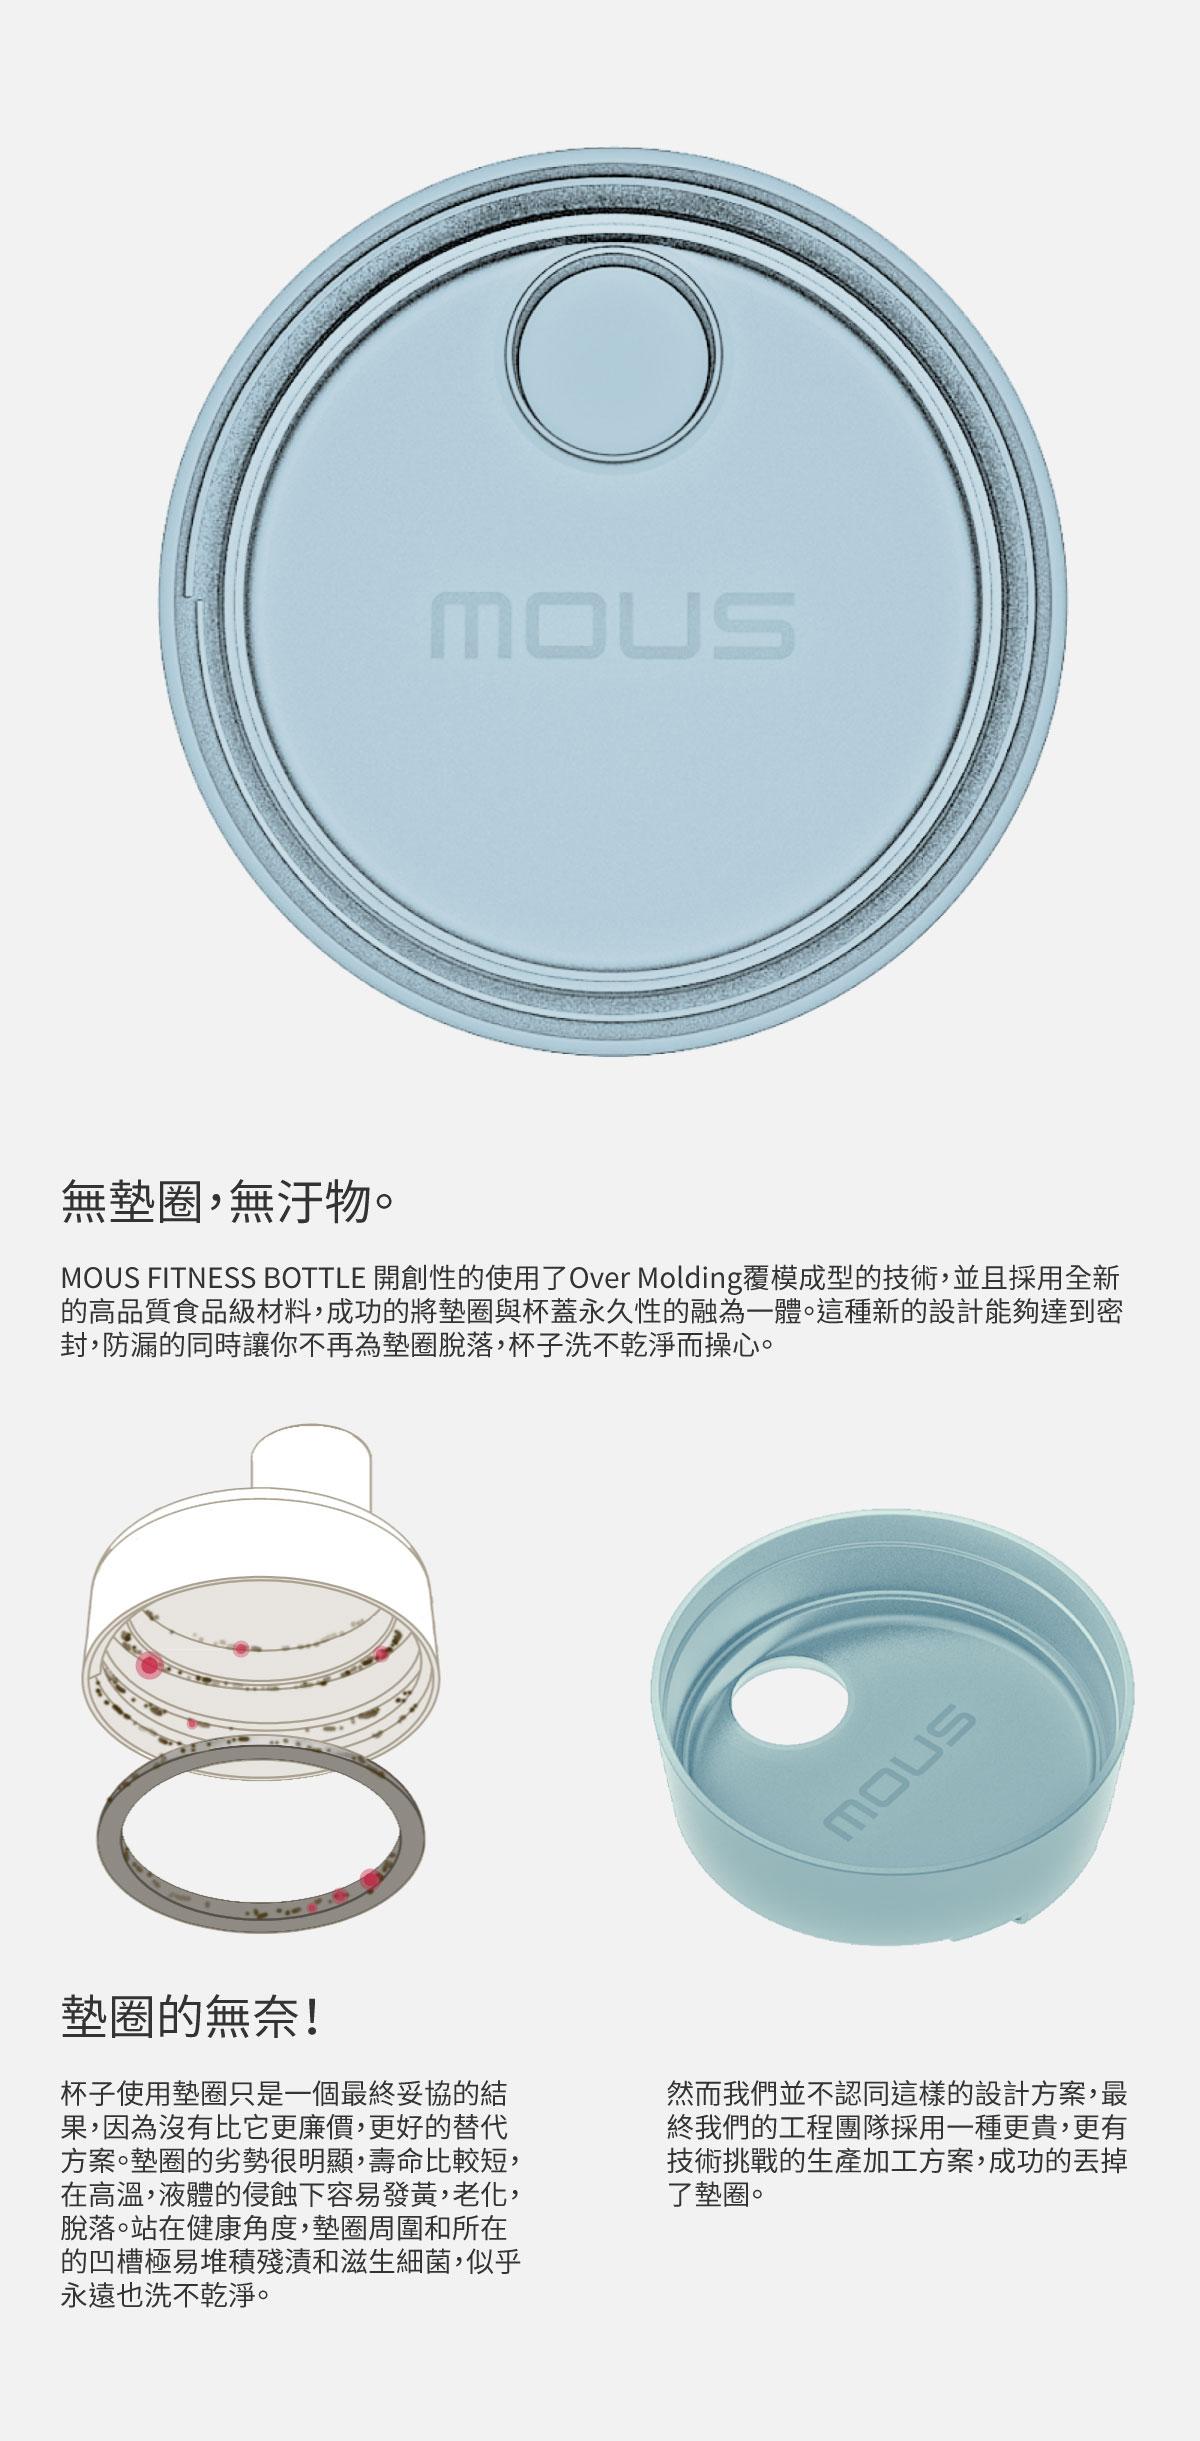 MOUS FITNESS的杯蓋採用over molding覆模成型技術且使用高品質食品及材料,墊圈與杯蓋融為一體,真正無墊圈的杯子